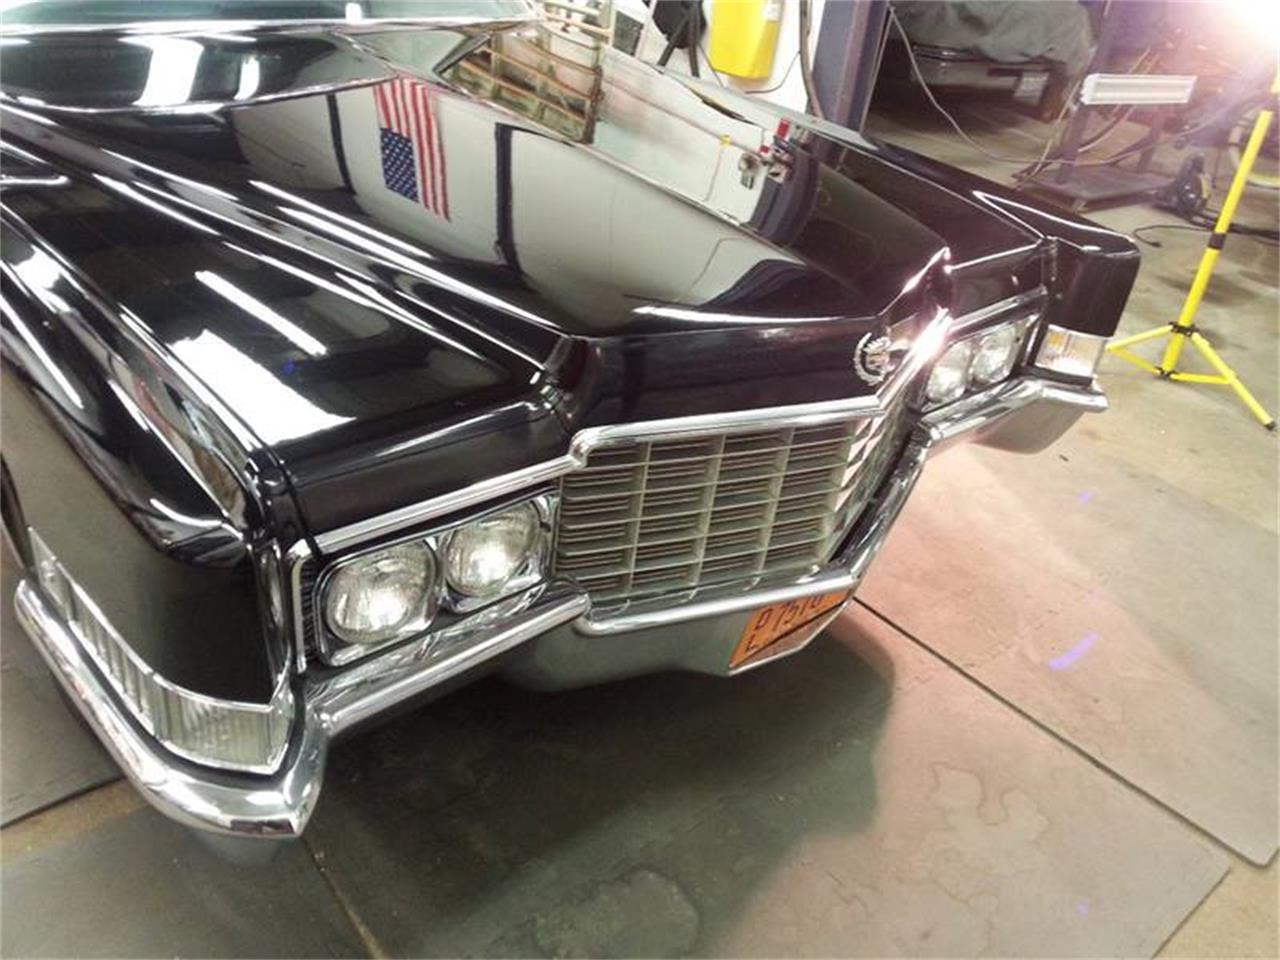 1969 Cadillac Fleetwood for Sale | ClassicCars.com | CC-847430